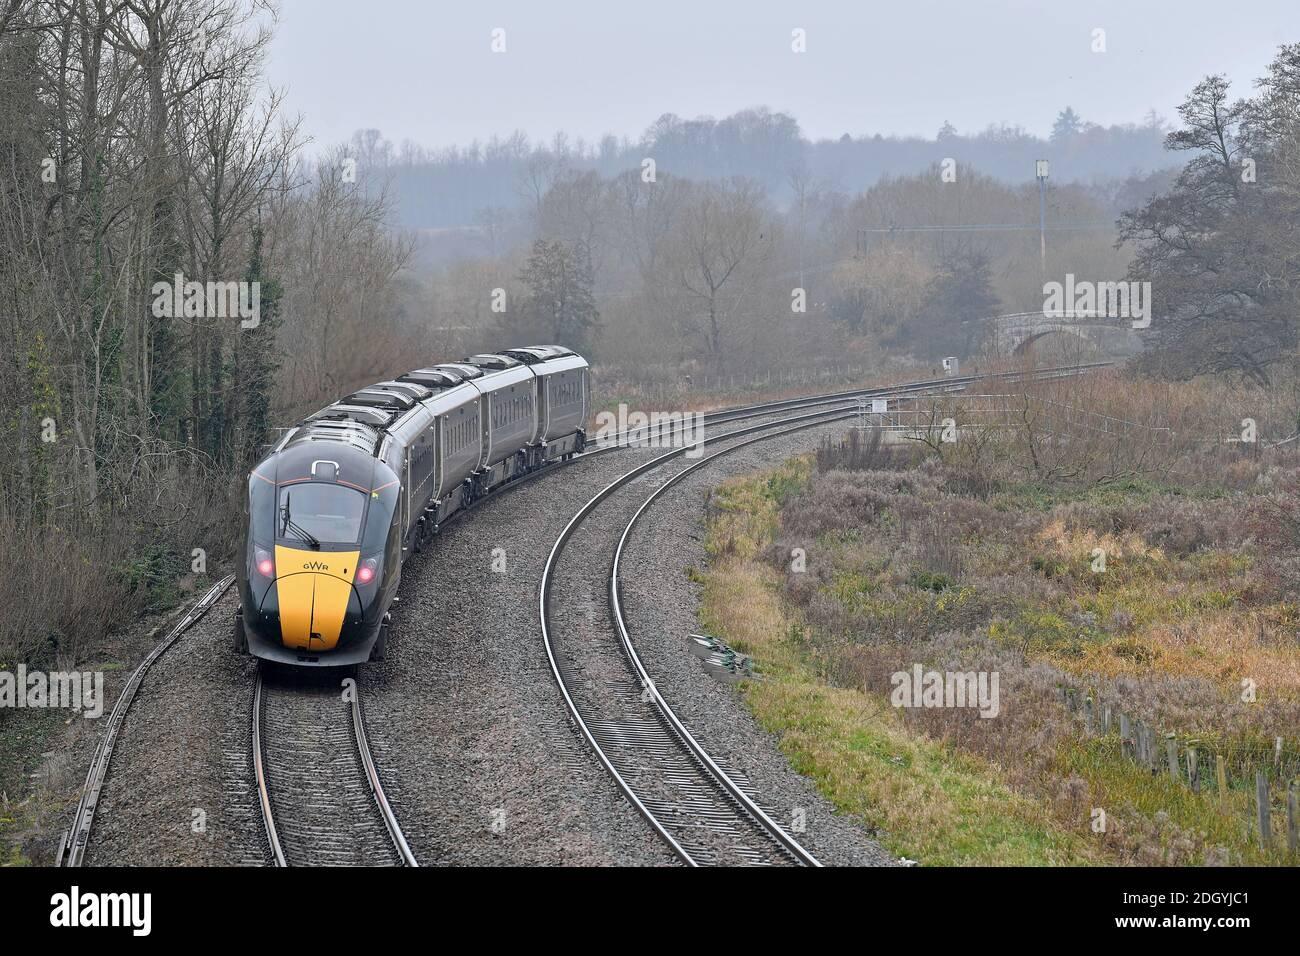 GV's of the village of Kintbury, near Hungerford, Berkshire - Train line, Wednesday 2nd December 2020. Stock Photo